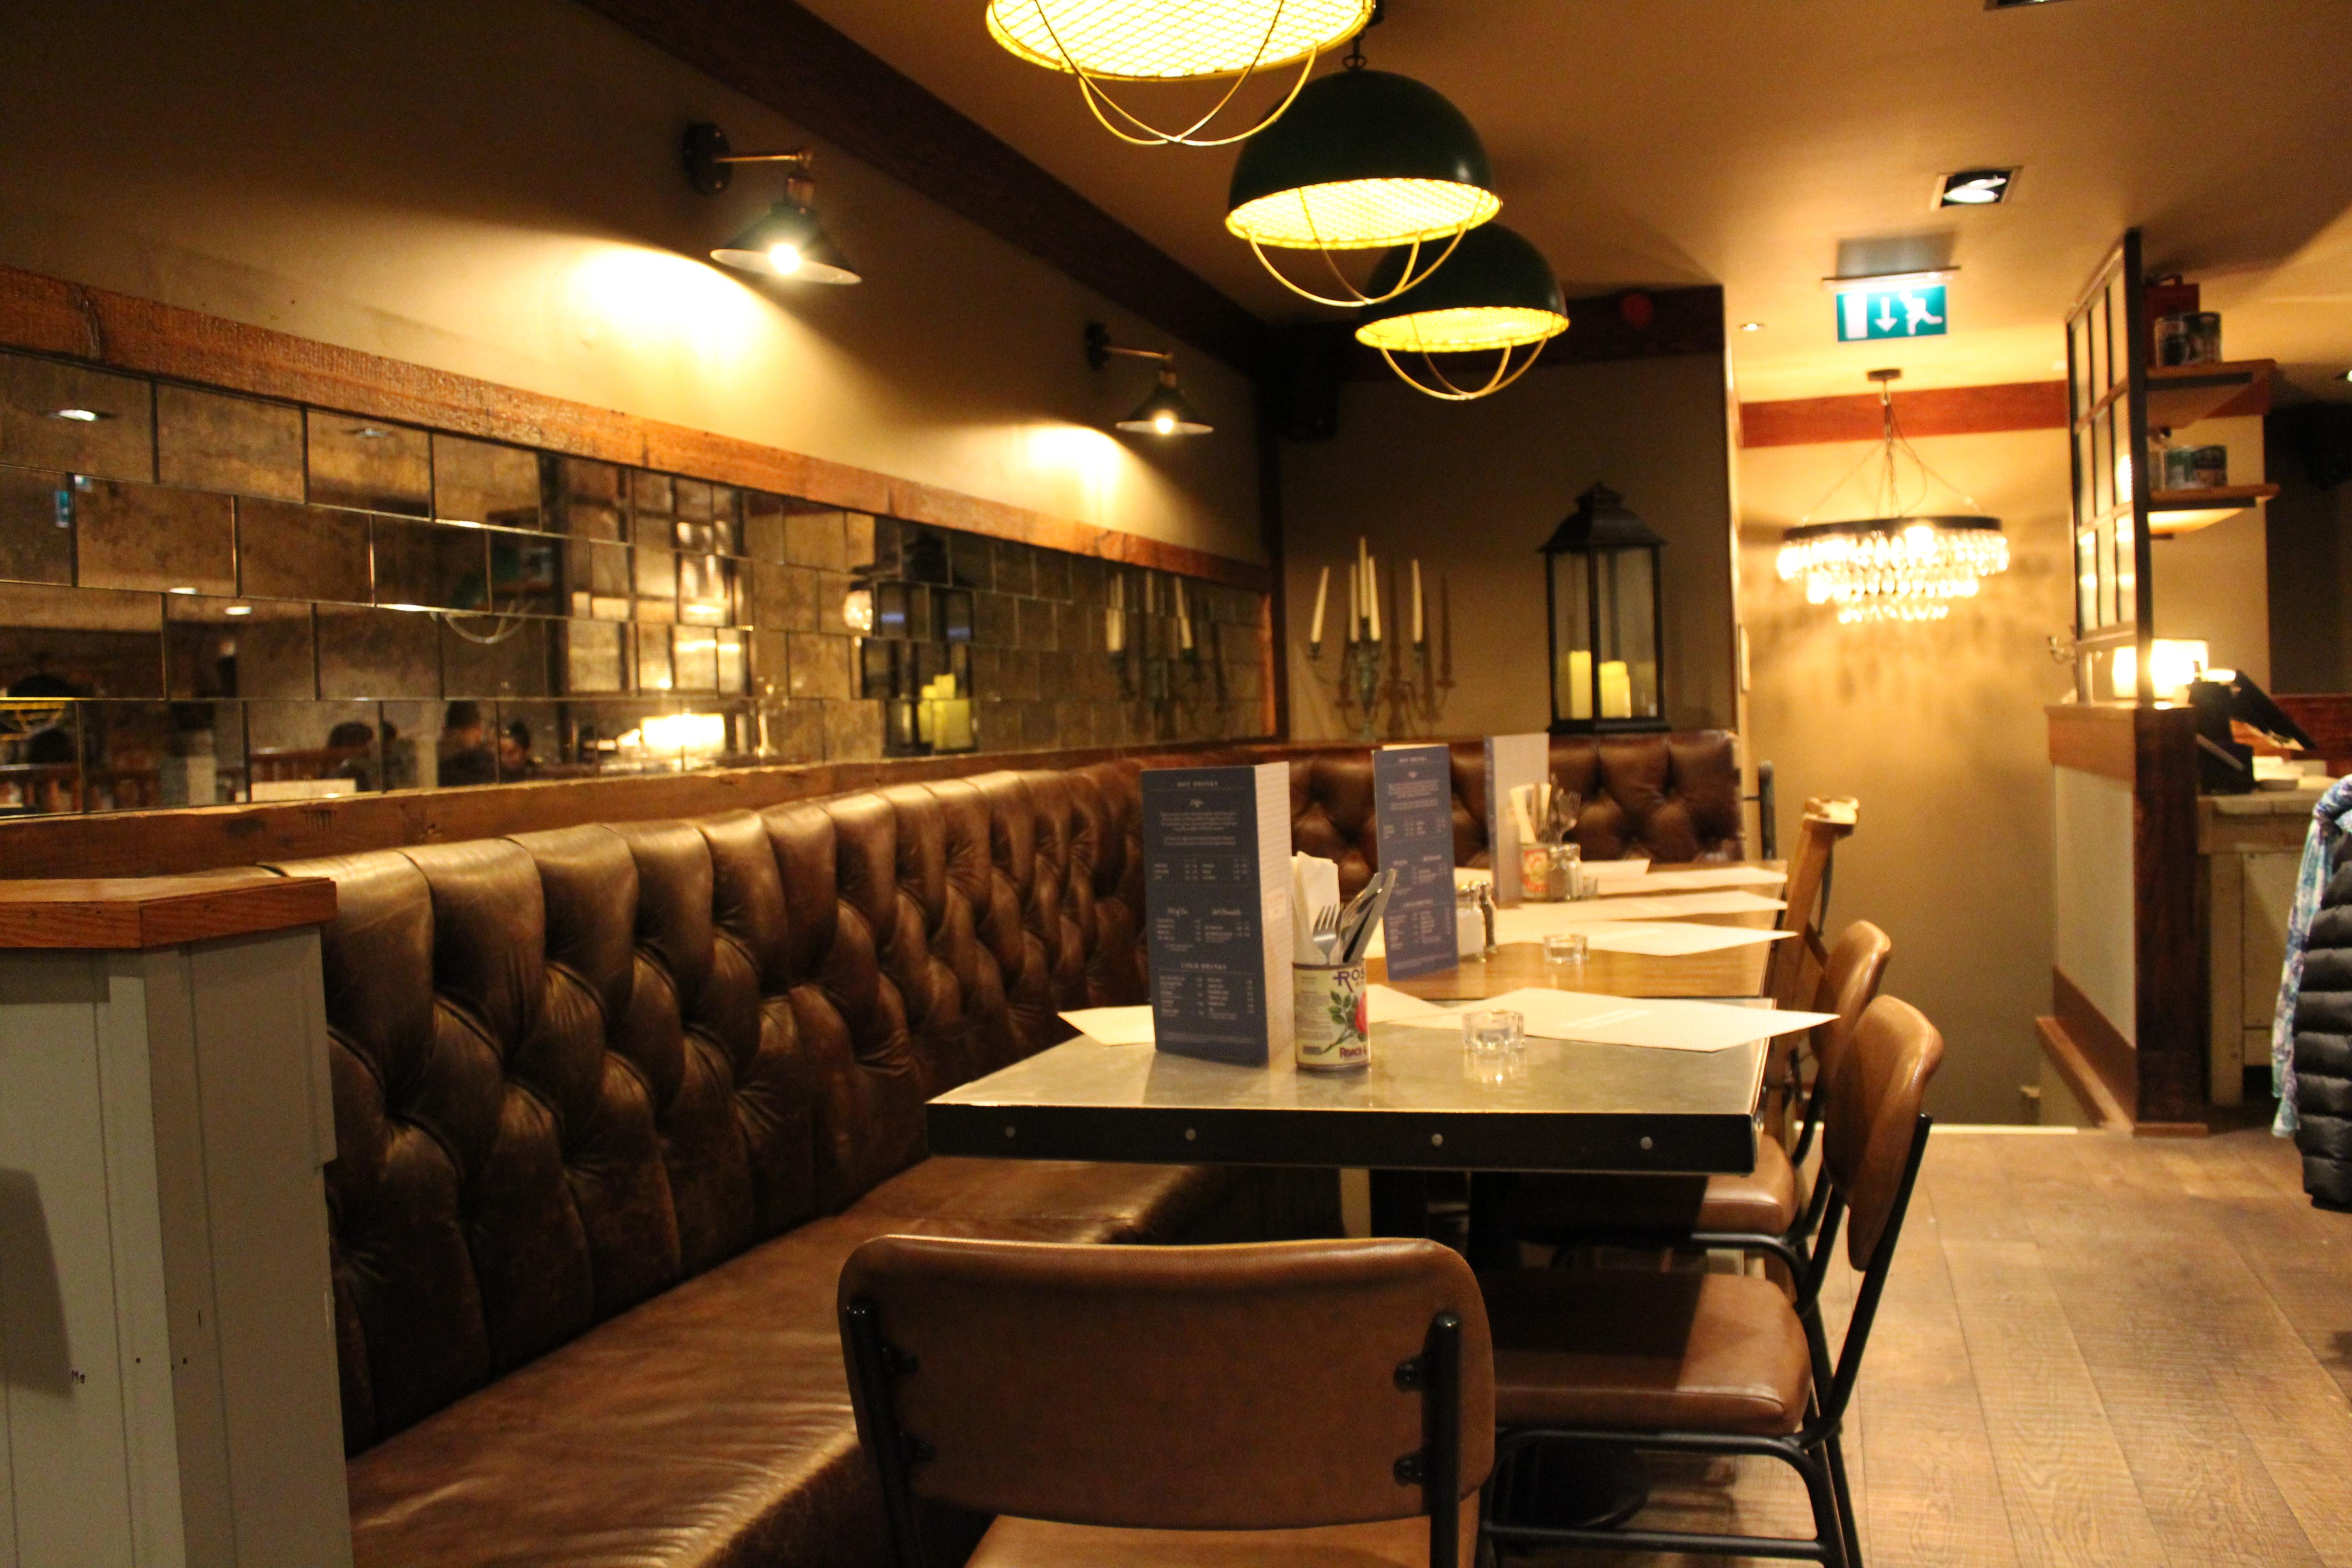 Joe\'s Kitchen Ludgate Hill, London (1)